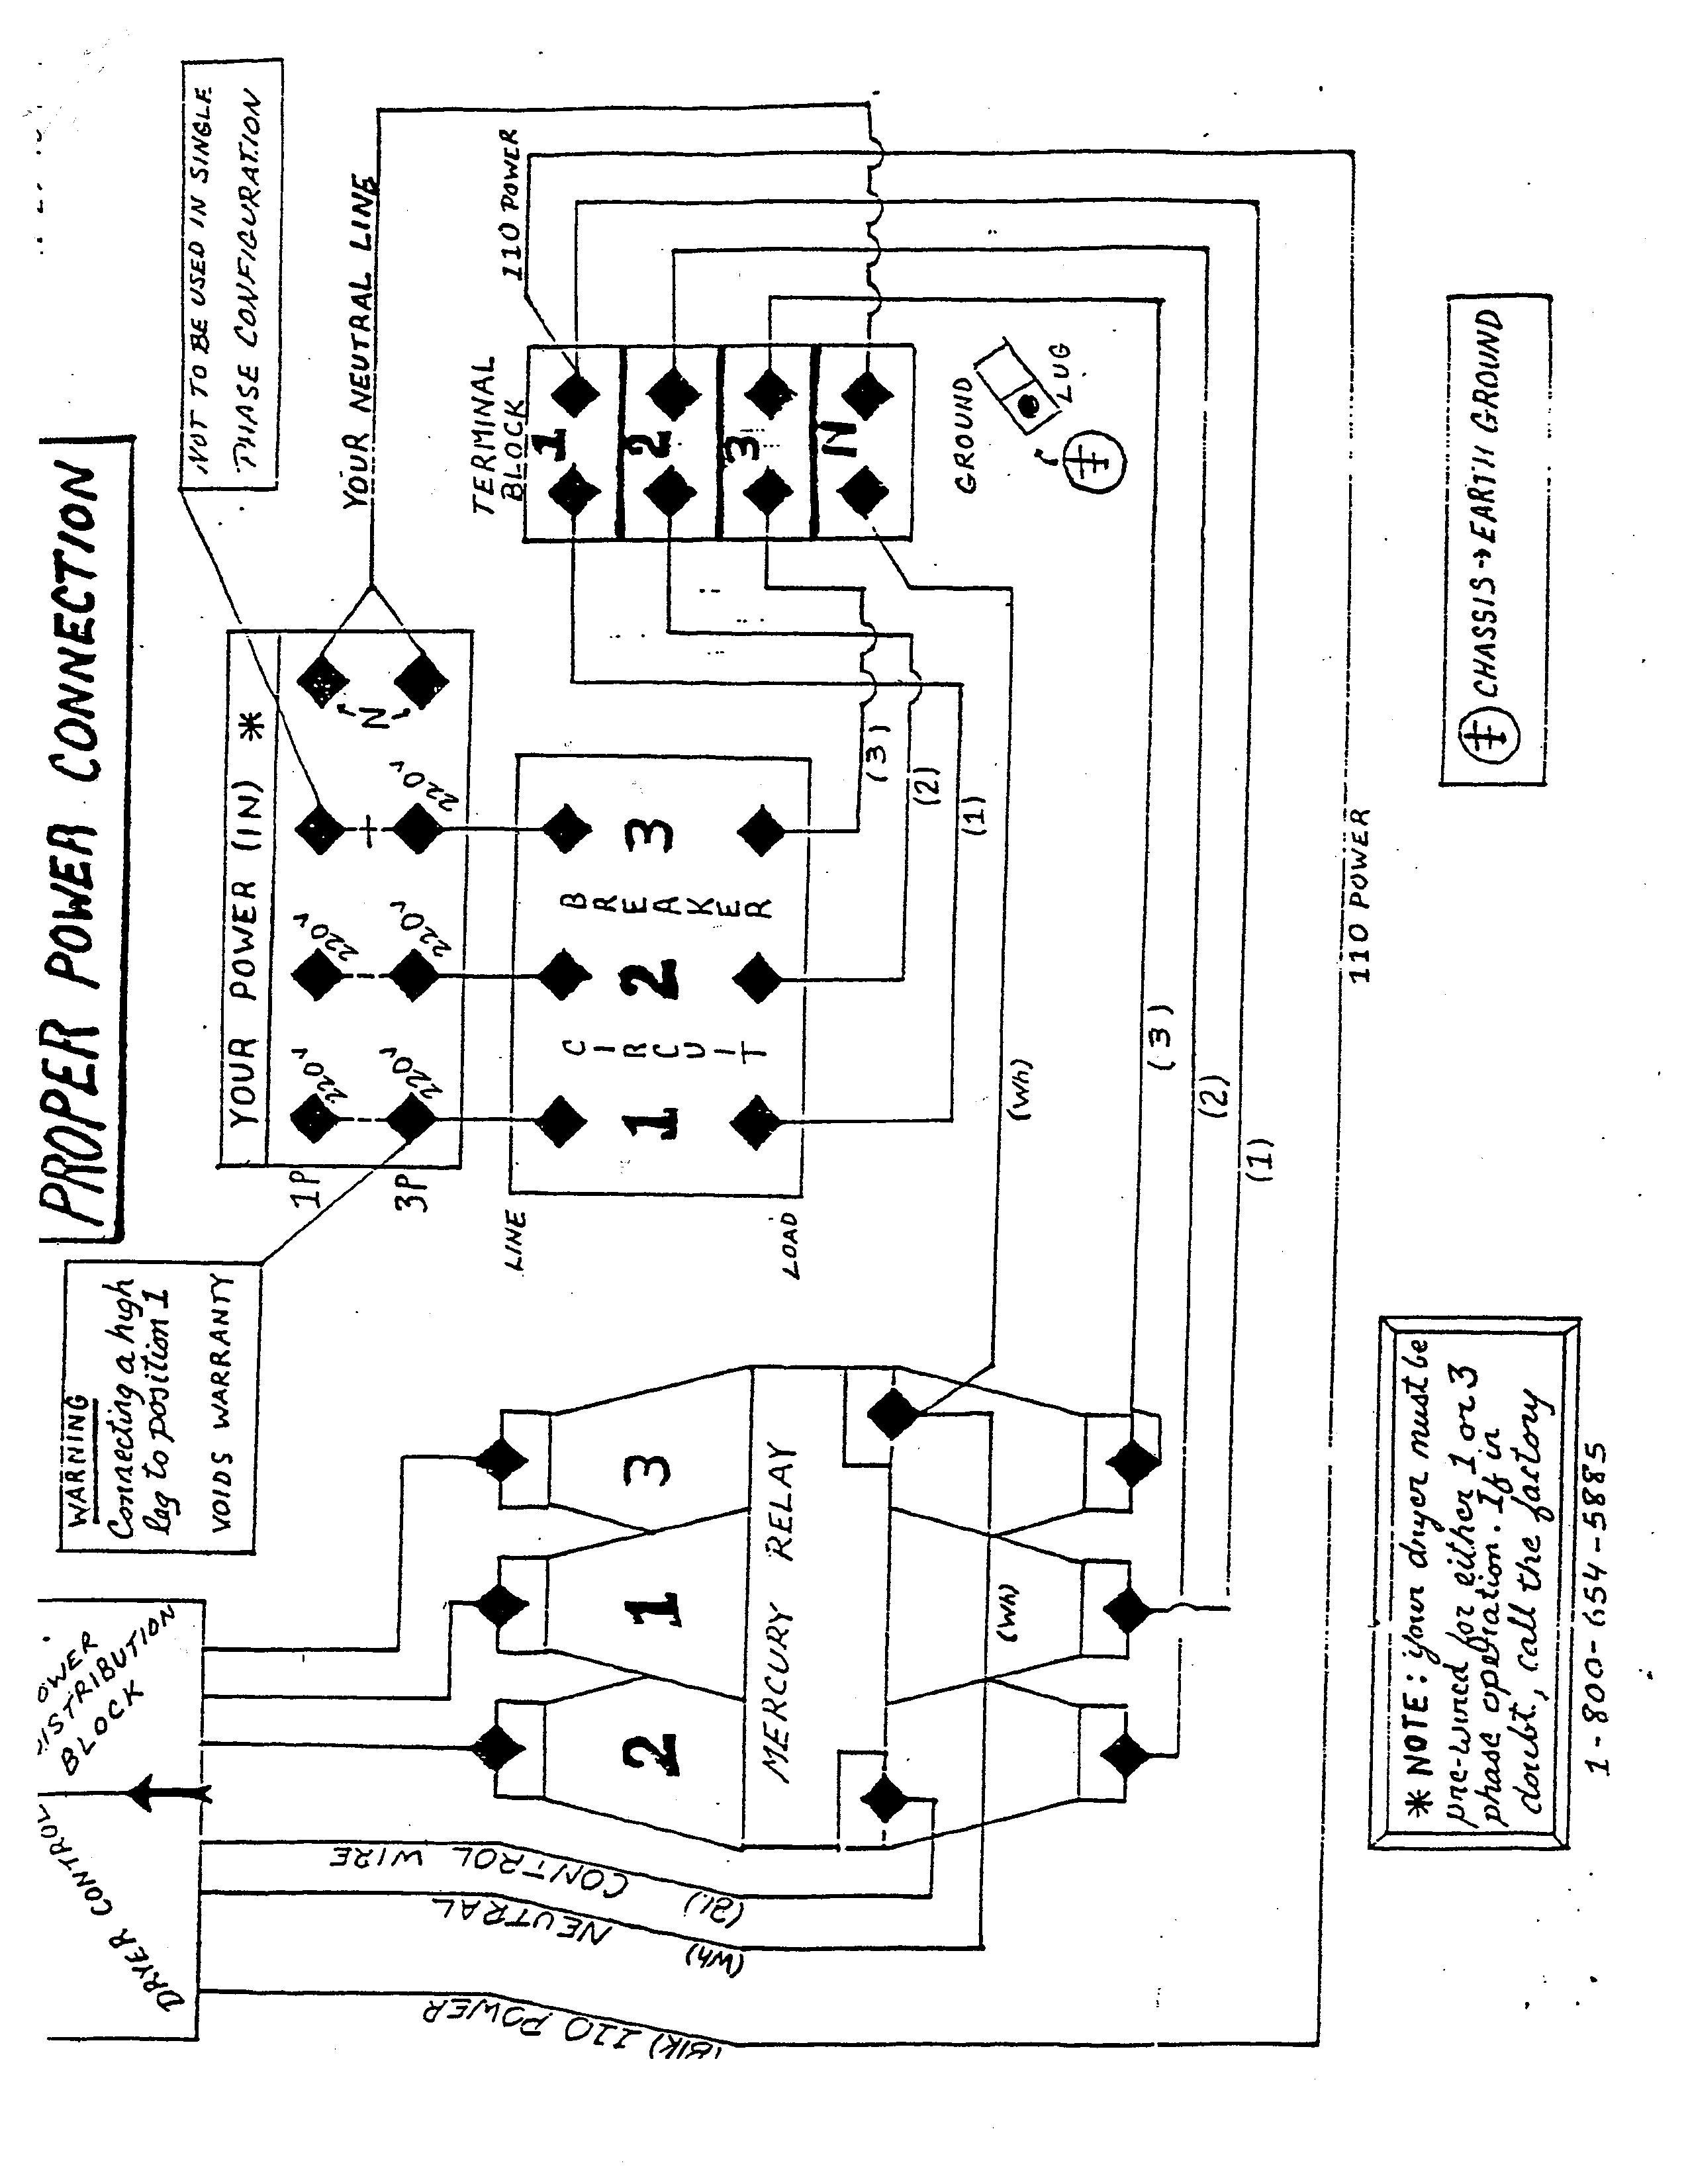 Wiring Diagram Thumbnail - Simple Wiring Diagram on garmin 7 pin wiring diagram, rei diagrams, lowrance wiring diagrams, garmin gpsmap schematic diagrams service manuals, delphi radio diagrams,